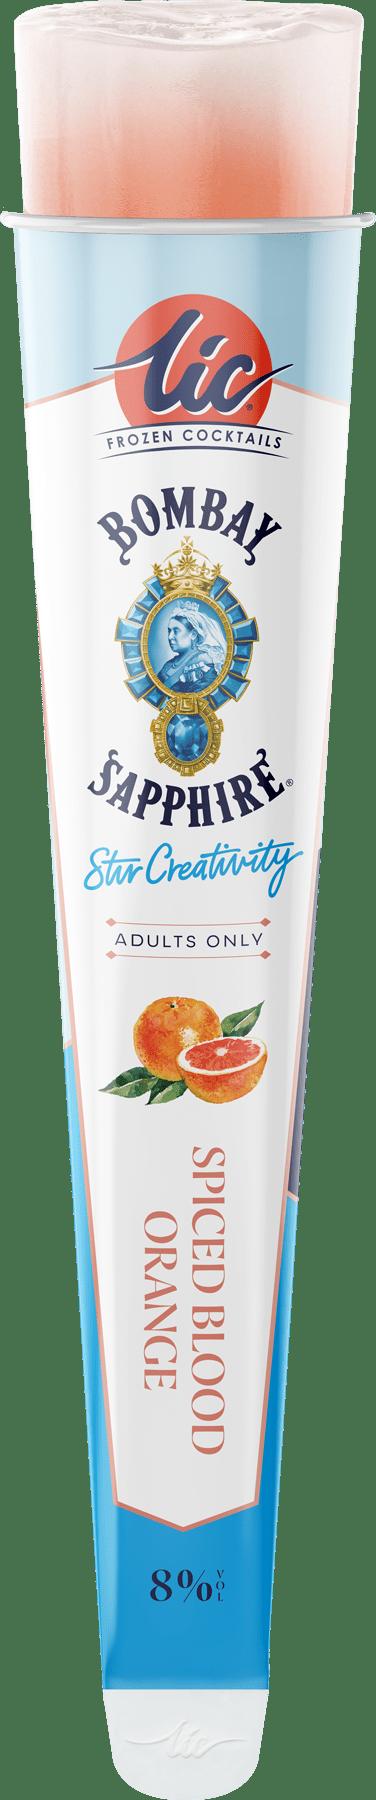 Spiced Blood Orange:Bombay Sapphire